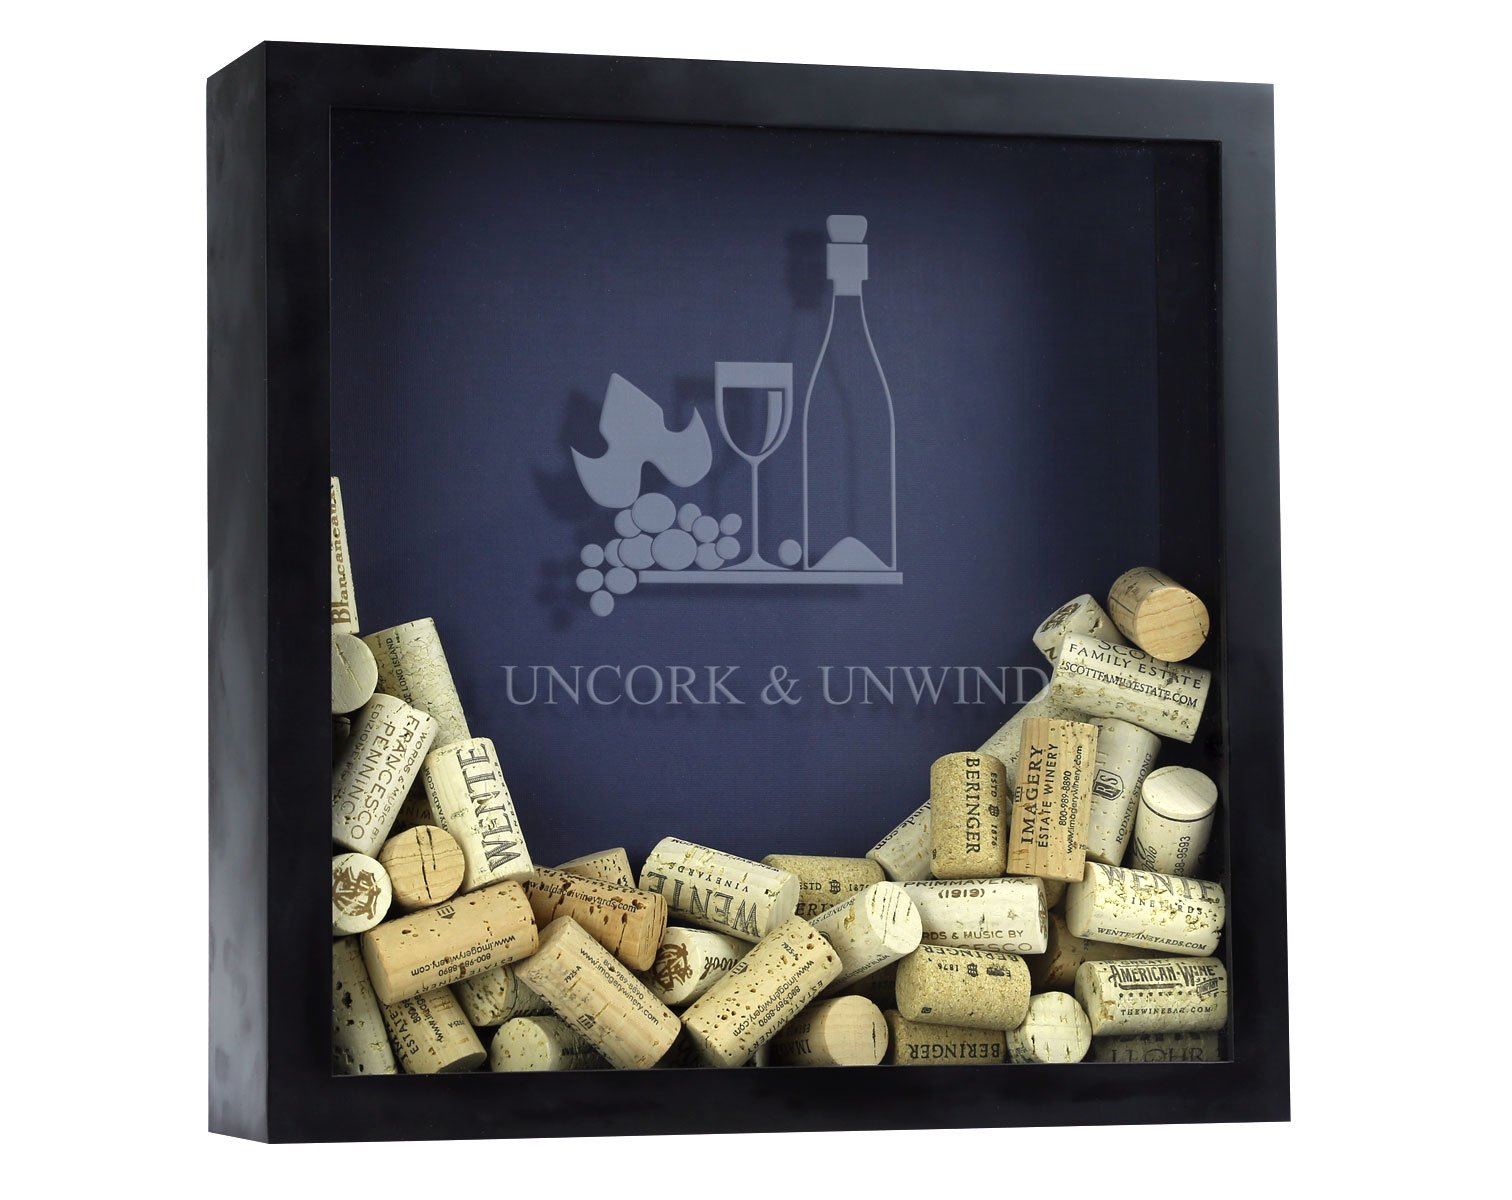 Wine Cork Shadow Box, Wine Cork Box, Wine Cork Storage, Uncork and Unwind